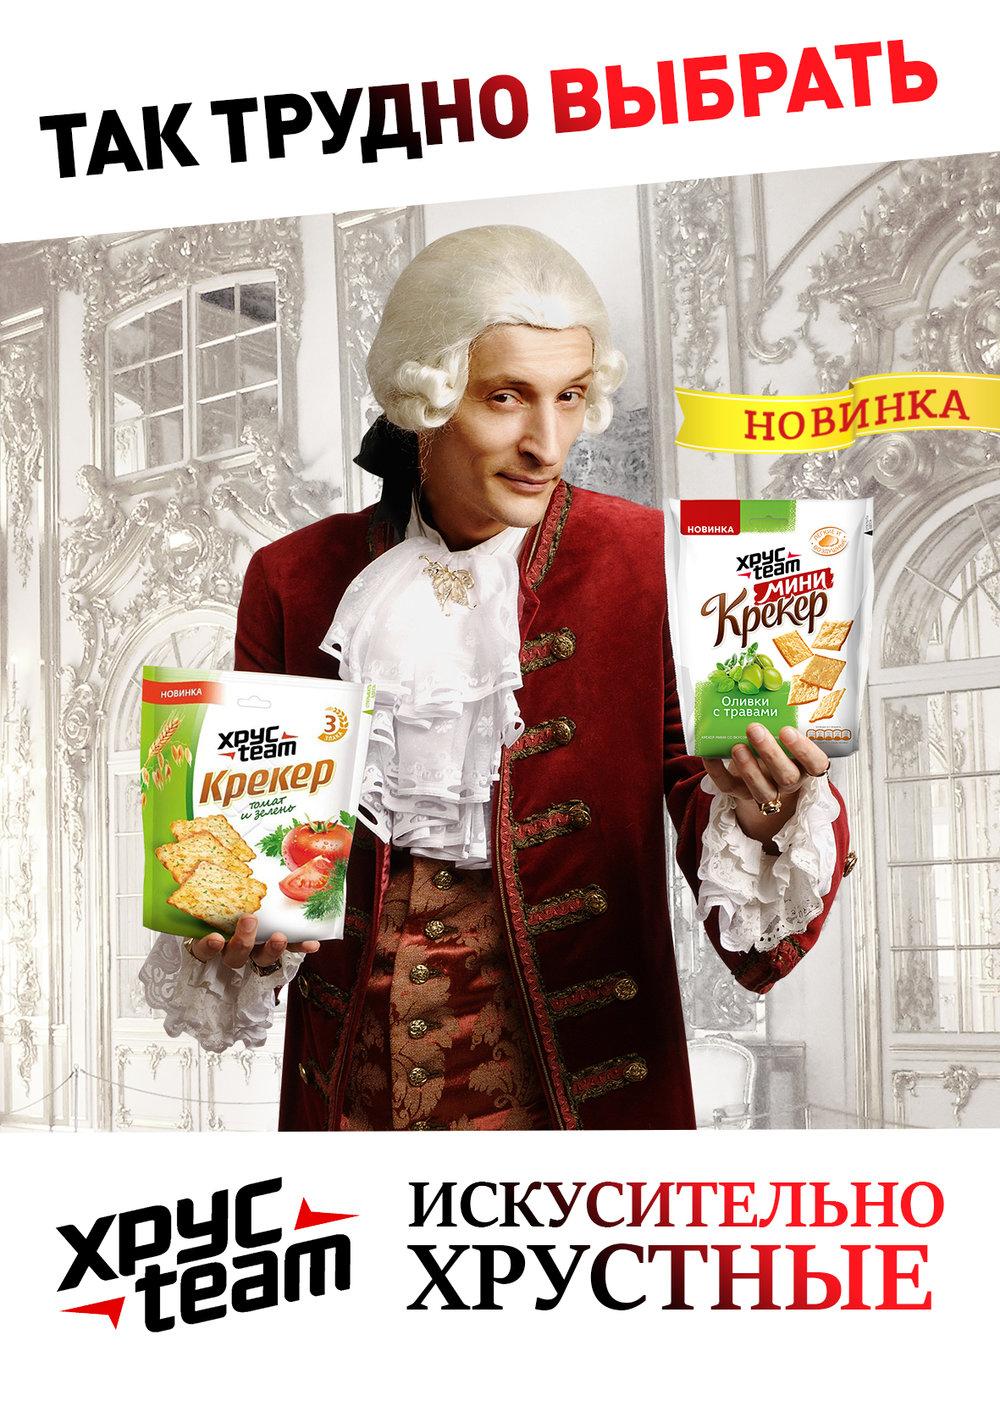 casanova Hrusteam Pavel Volya.jpg